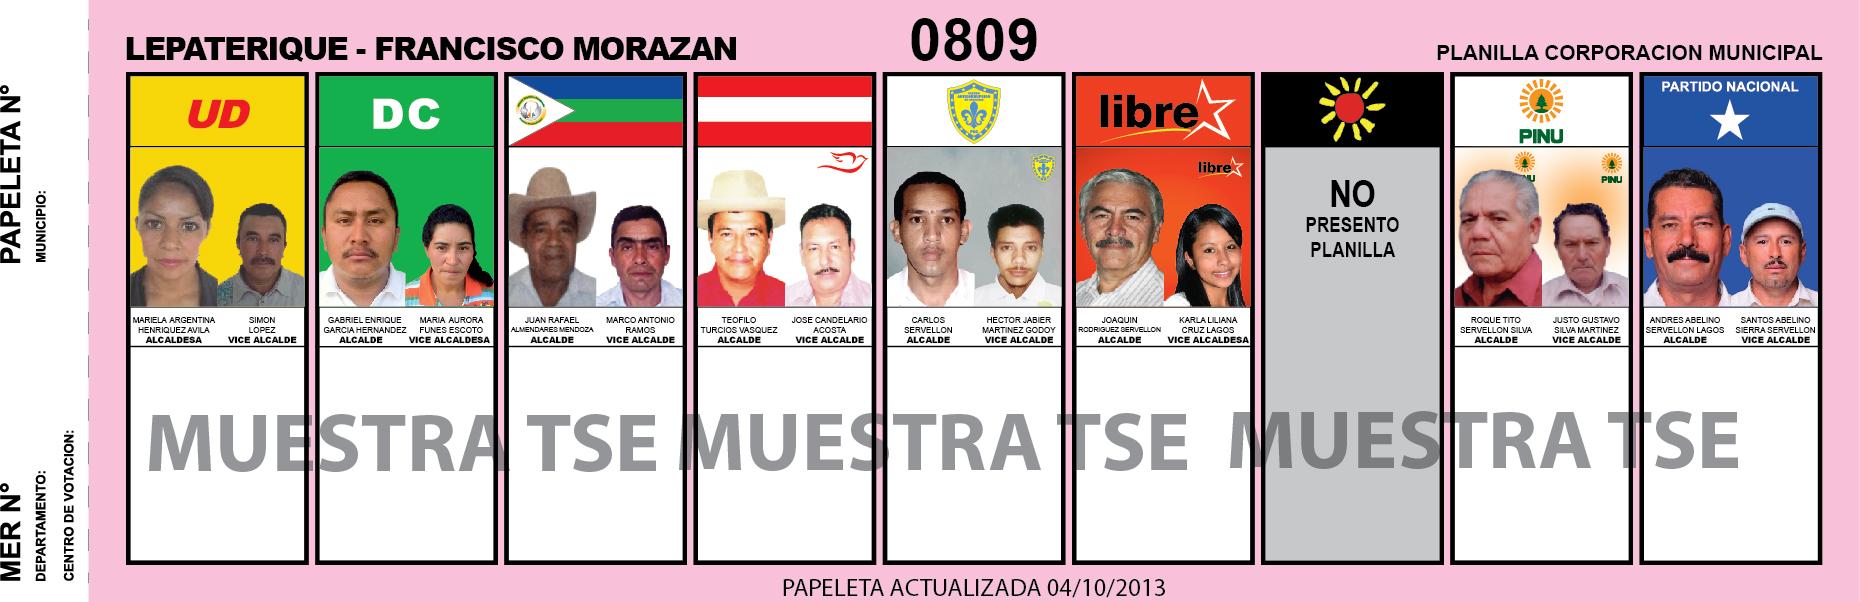 CANDIDATOS 2013 MUNICIPIO LEPATERIQUE - FRANCISCO MORAZAN - HONDURAS